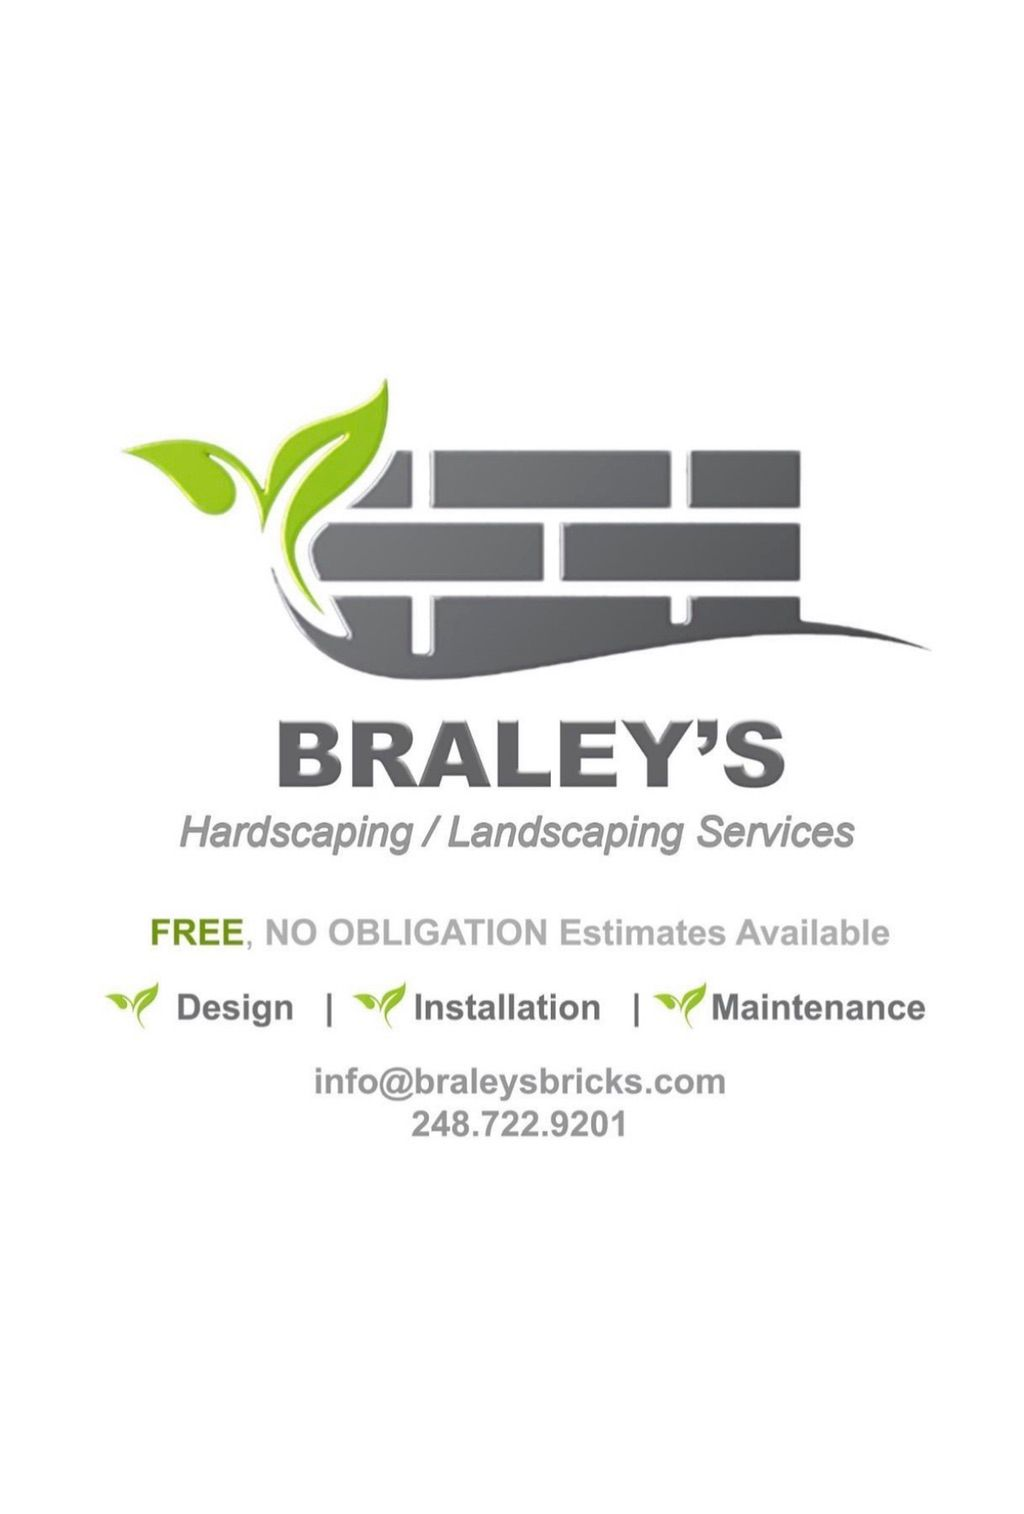 Braley's Brickscapes